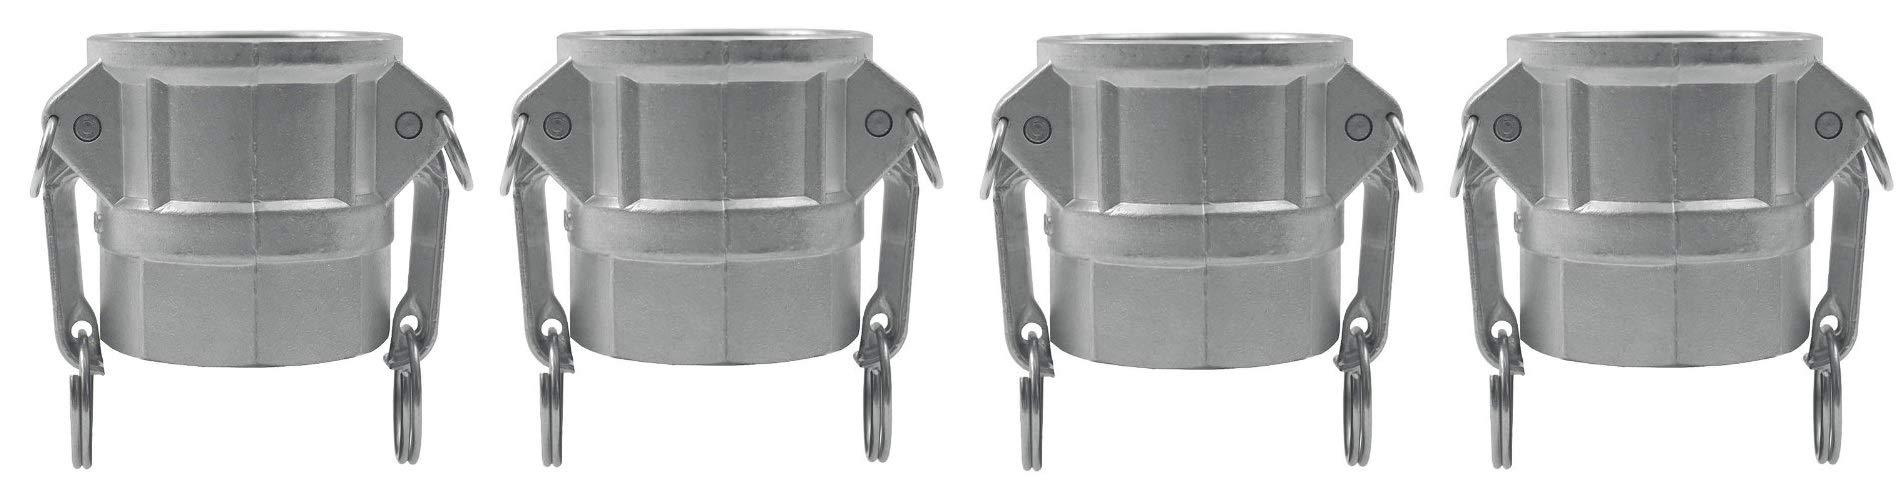 JGB Enterprises 030-04032-832CI Aluminum Type D Cam and Groove Fitting, 2'' Female Coupler x 2'' Female NPT (Fоur Расk)